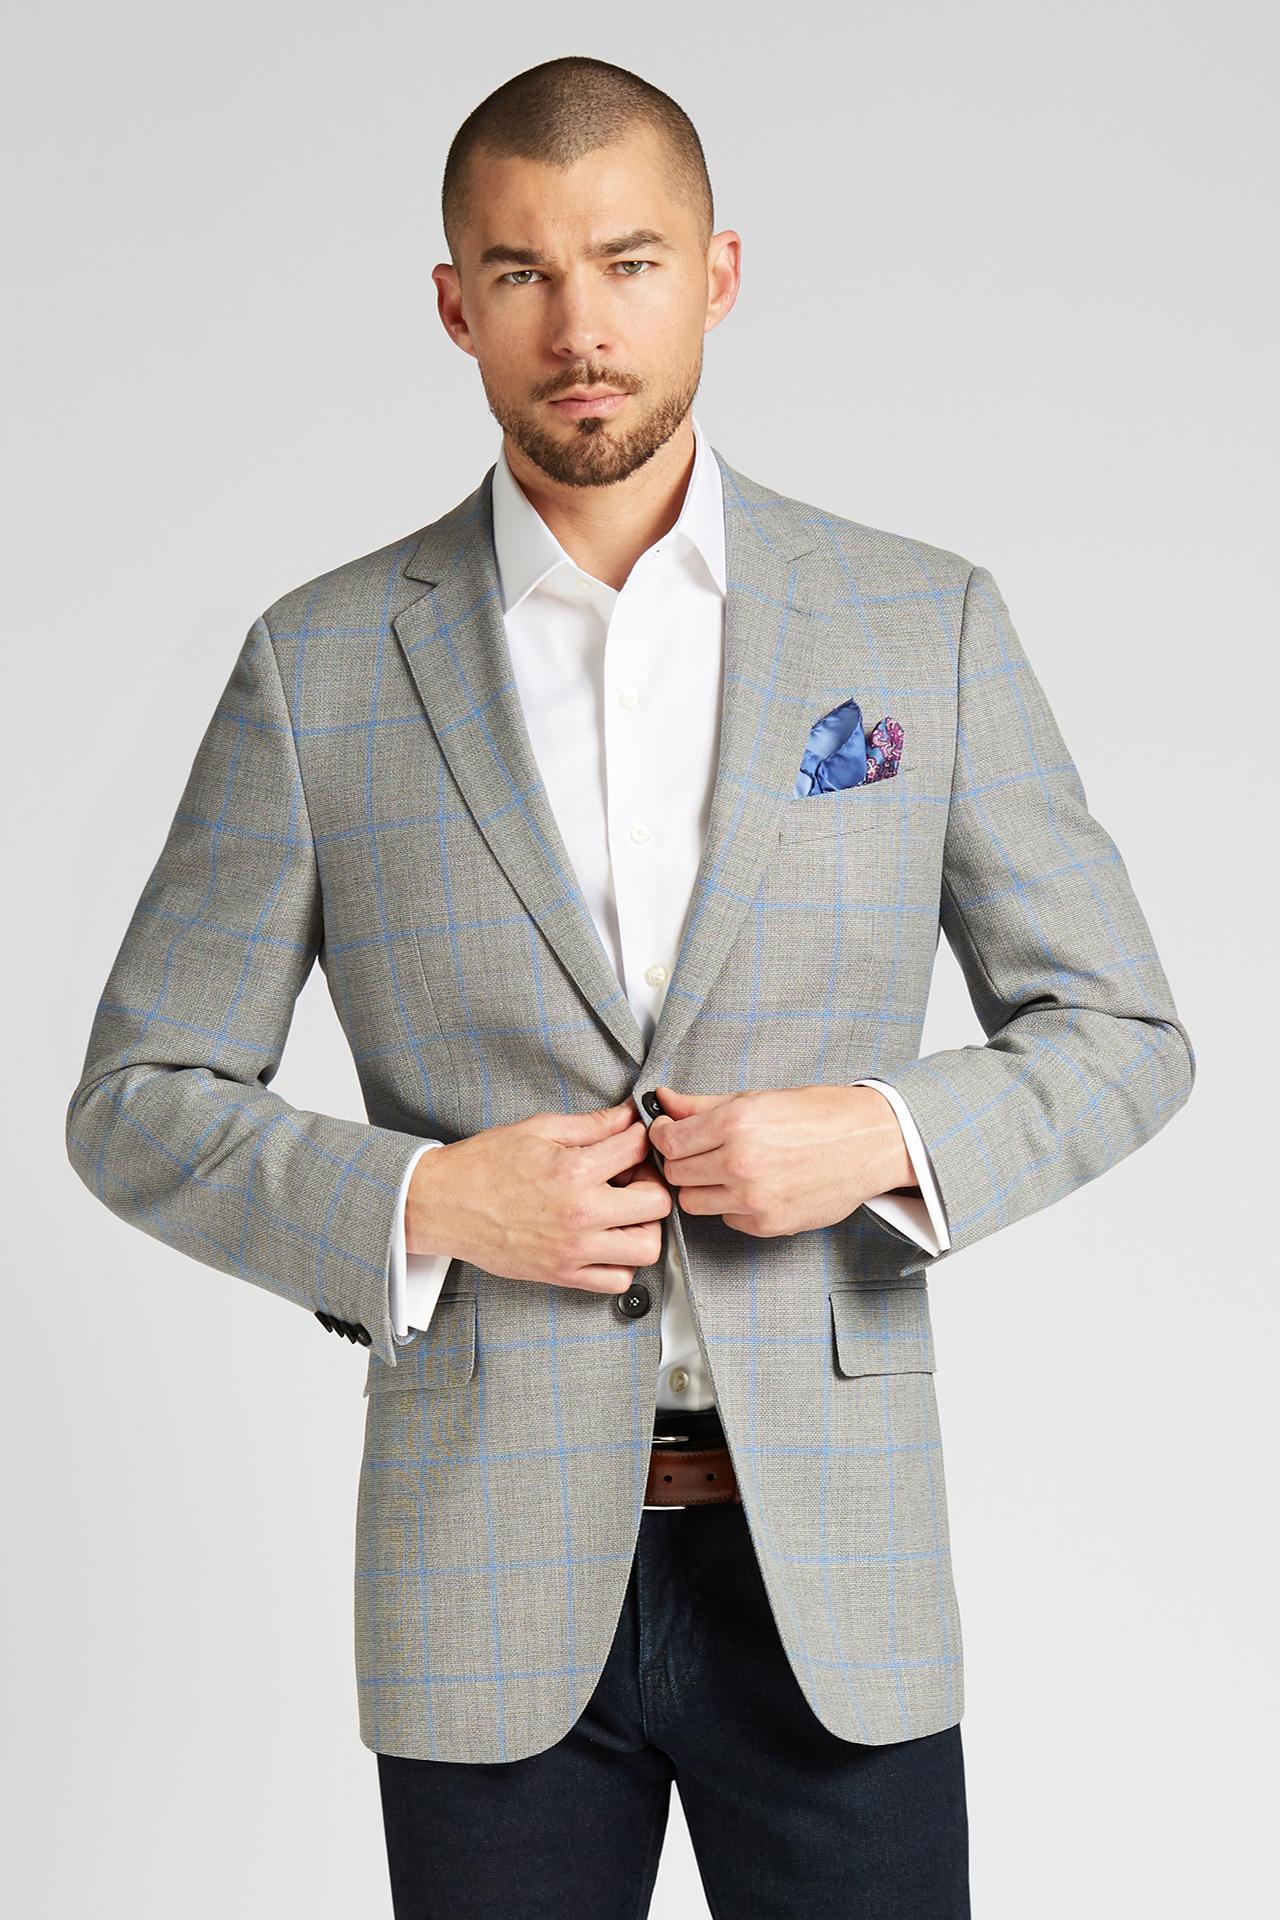 Slim-Fit 4-Season Wool Jacket in Grey with French Blue Windowpane